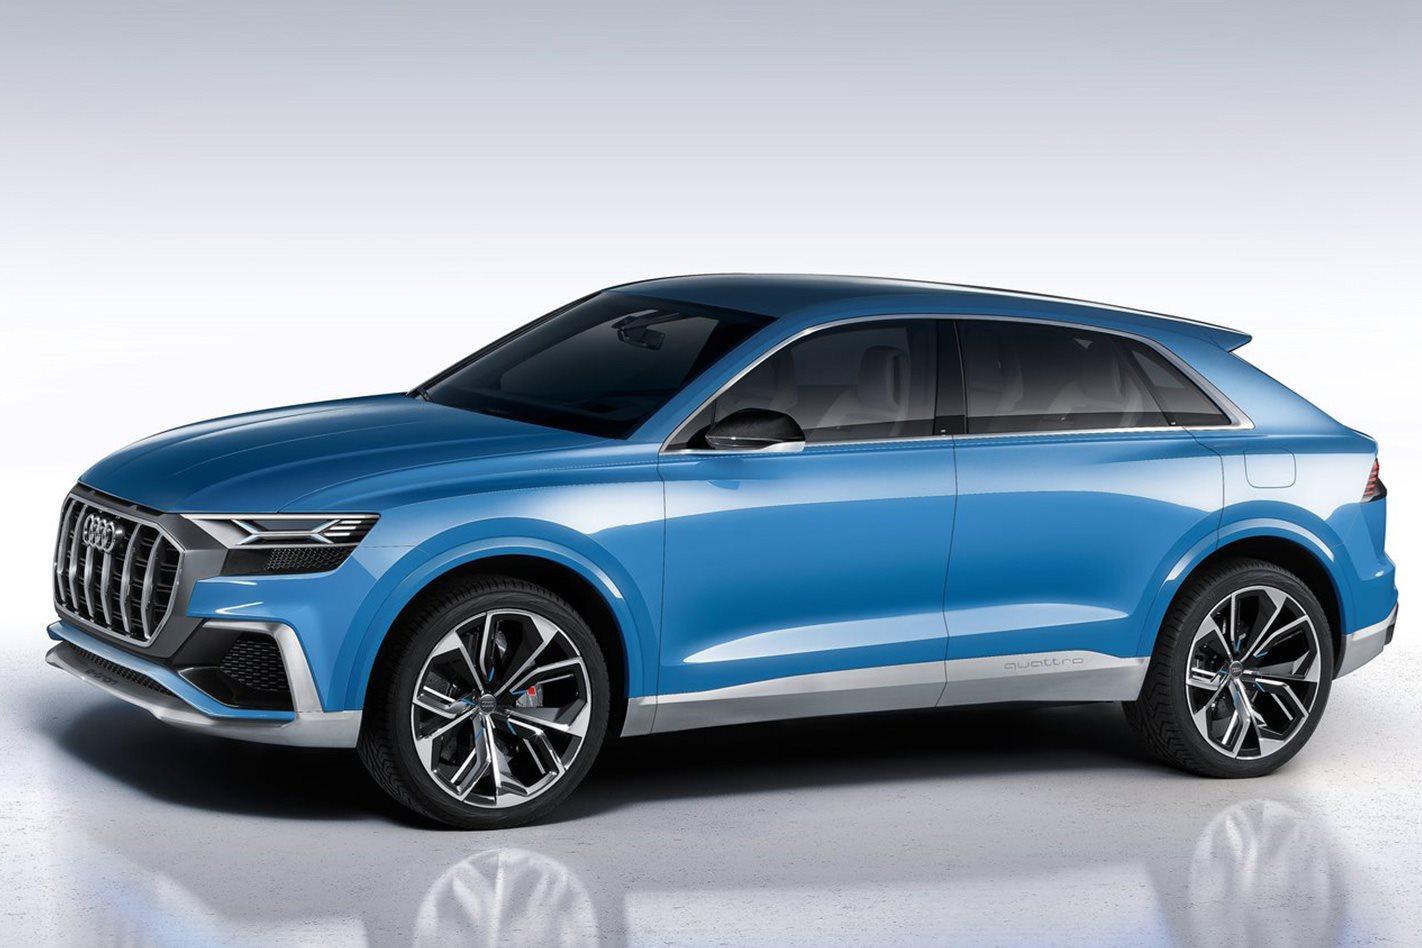 2019 Audi RS Q8 breaks company power ceiling: report